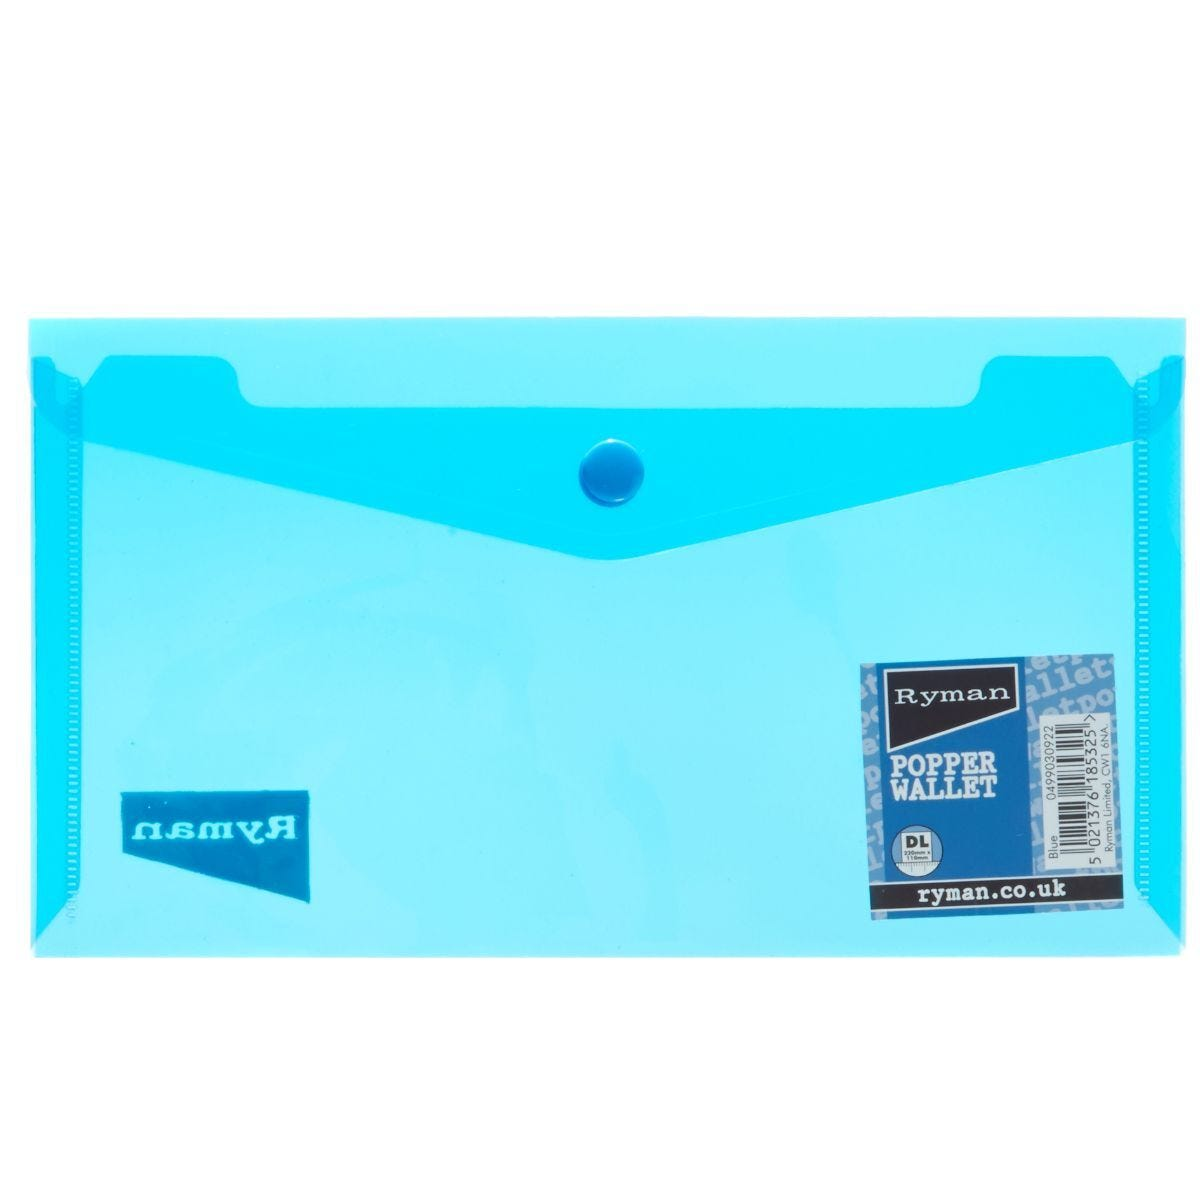 Ryman Popper File DL Landscape Blue